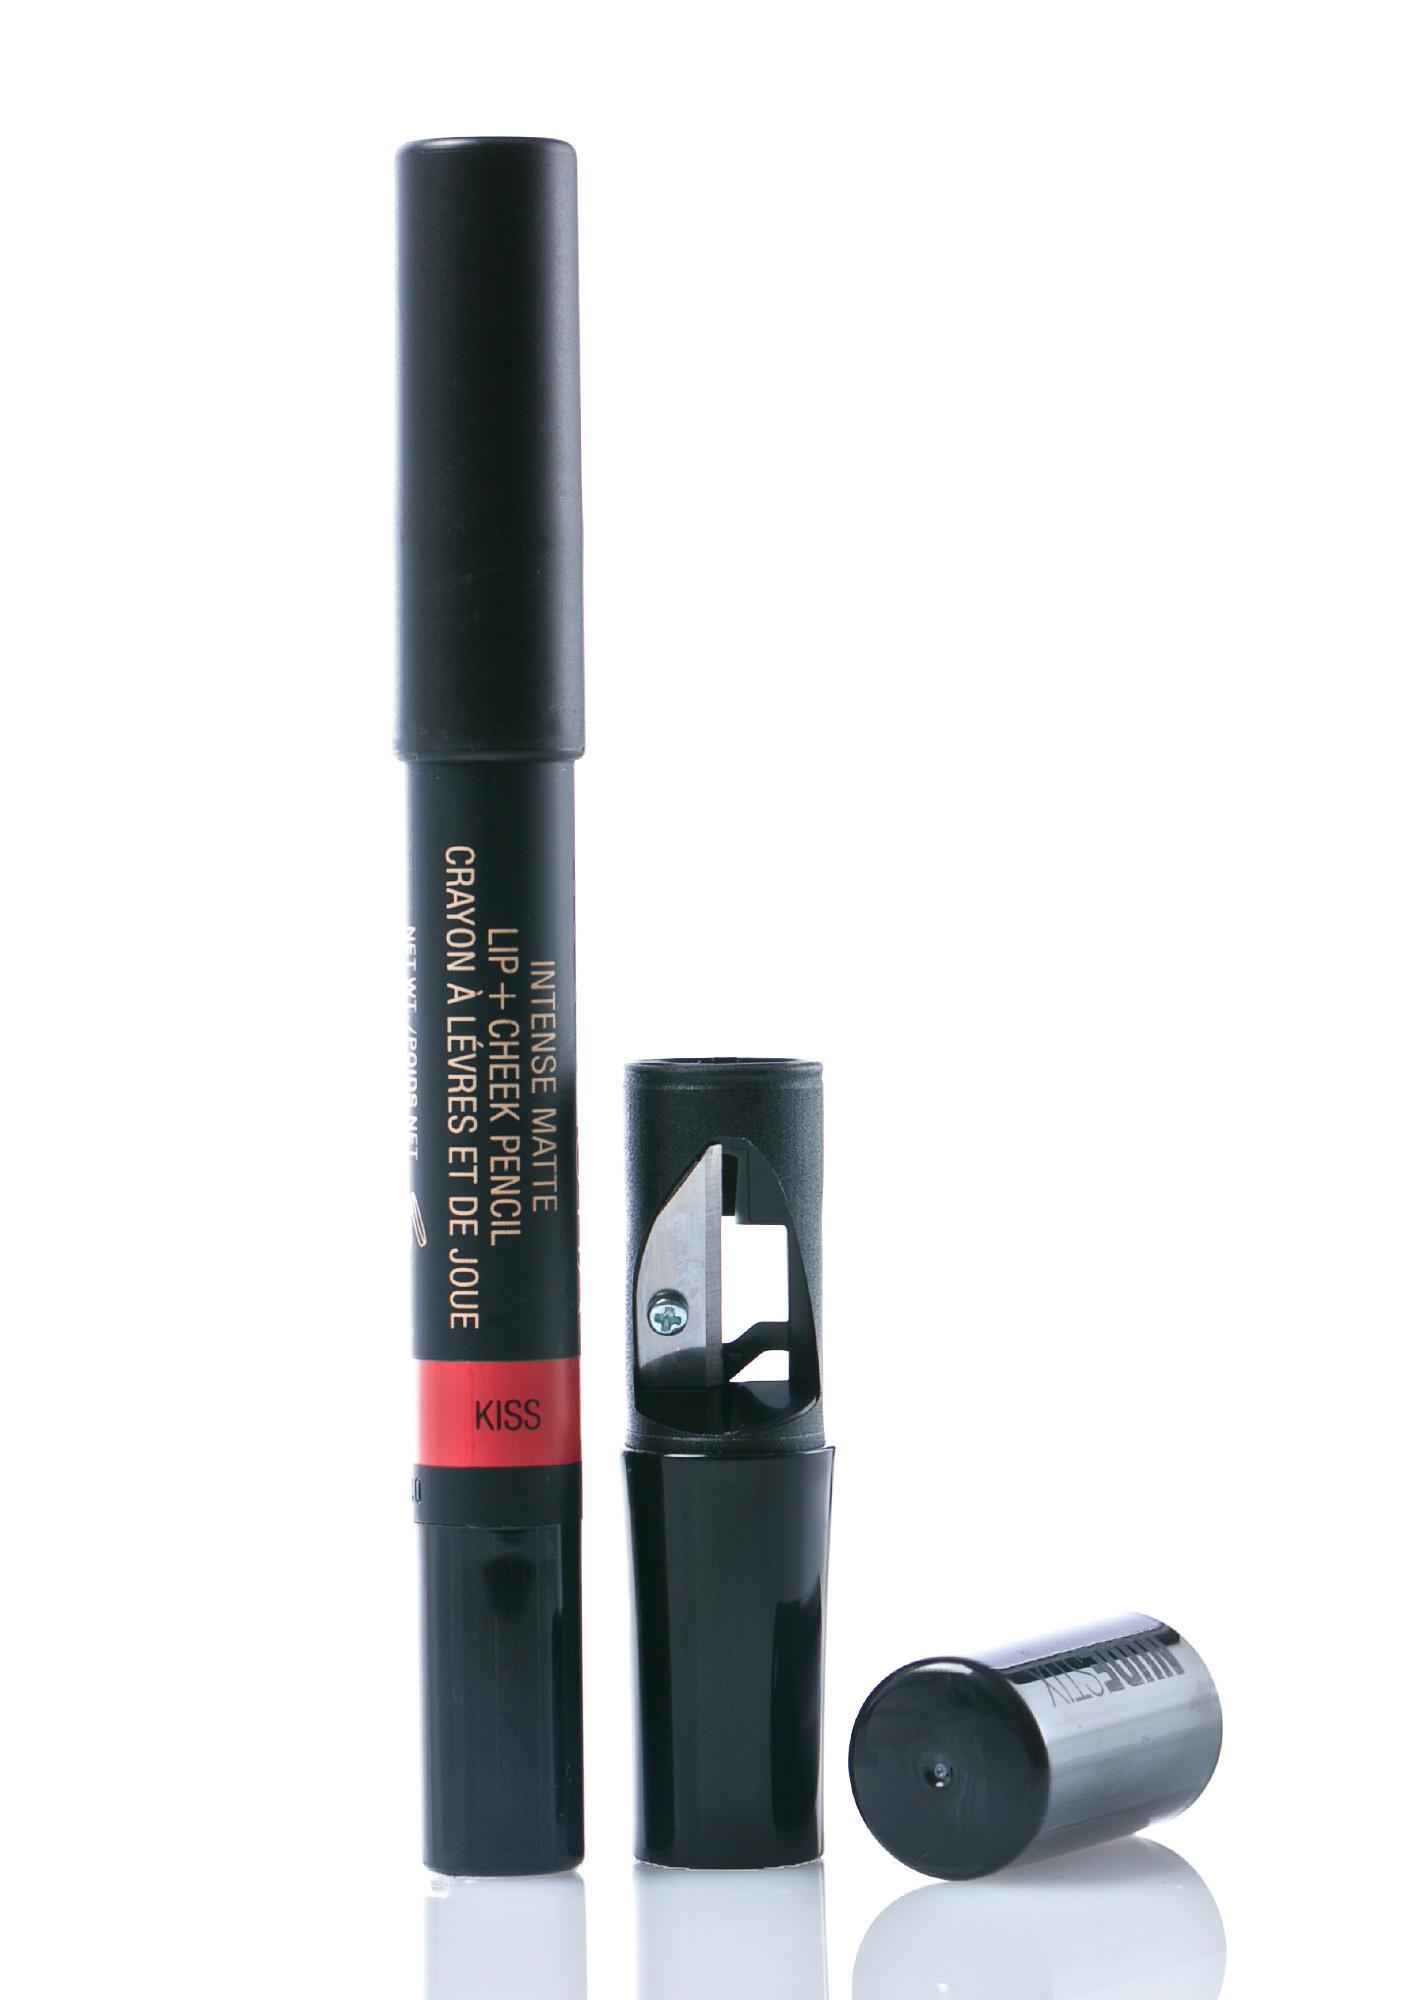 Nudestix Kiss Matte Lip + Cheek Pencil